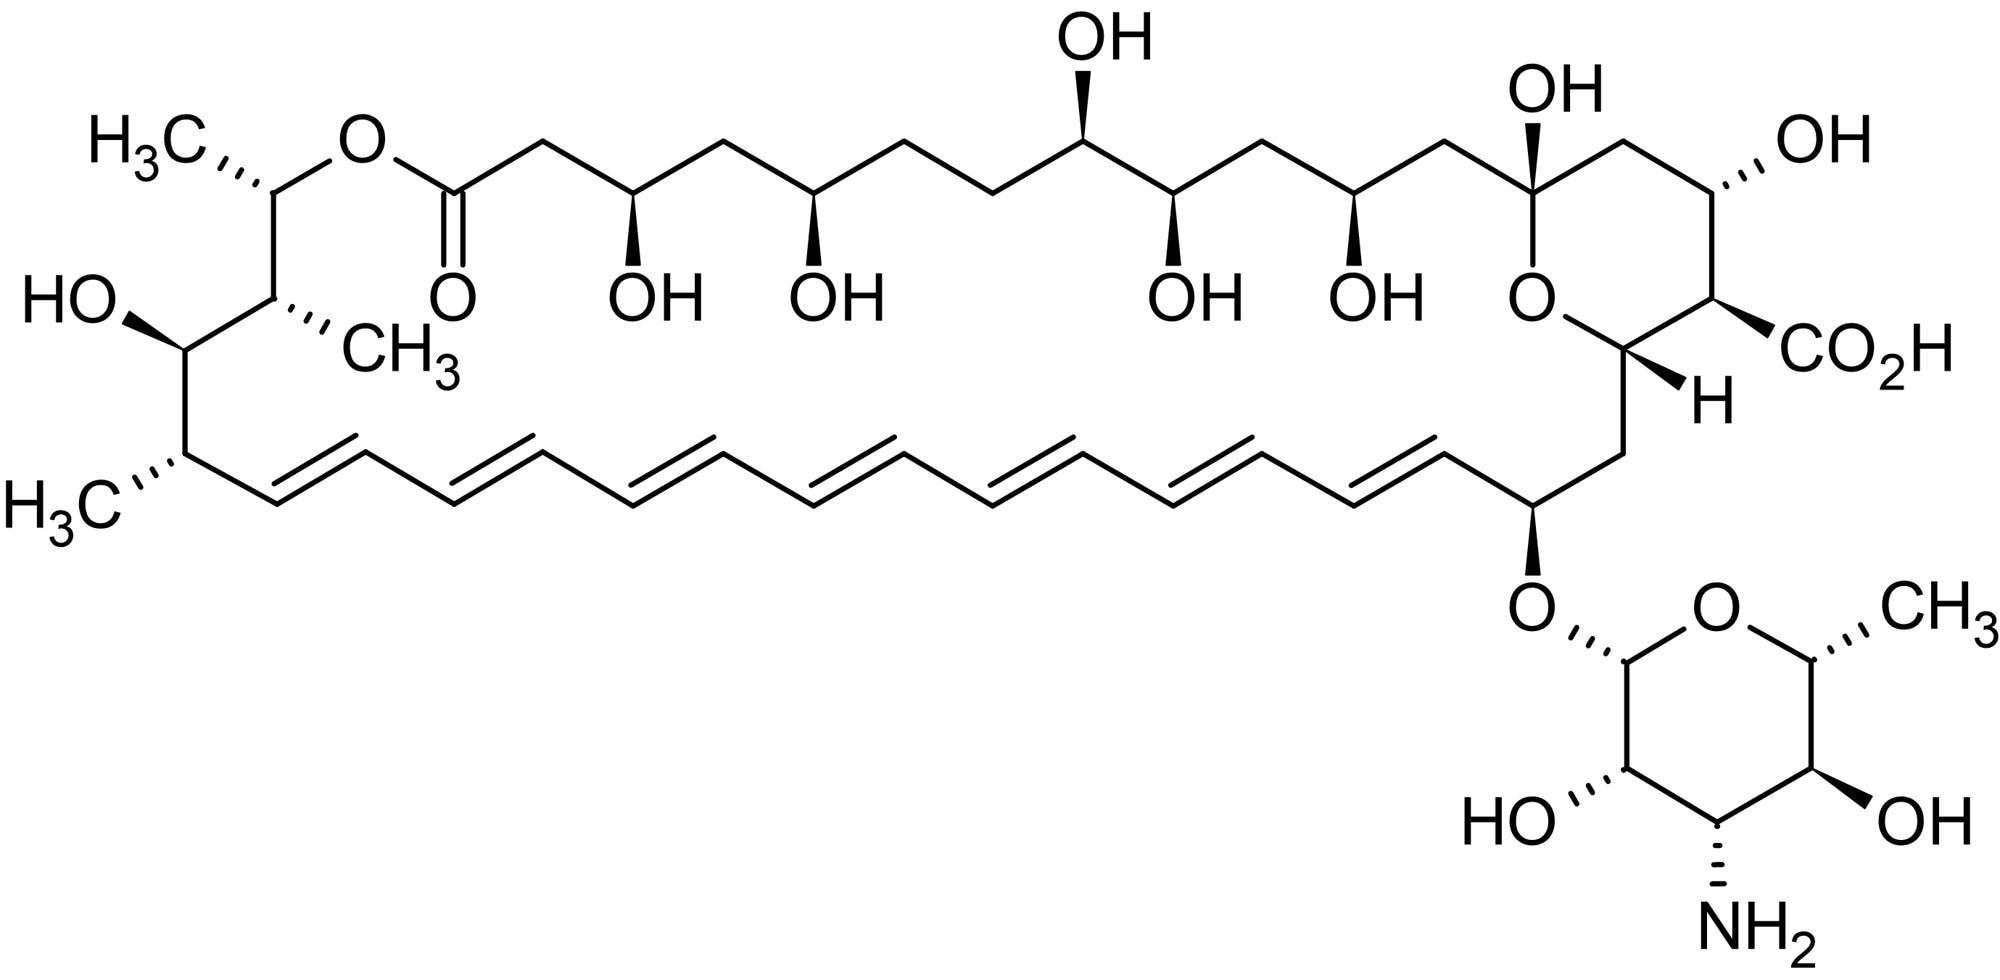 Chemical Structure - Amphotericin B (aqueous), polyene antifungal antibiotic (ab146566)